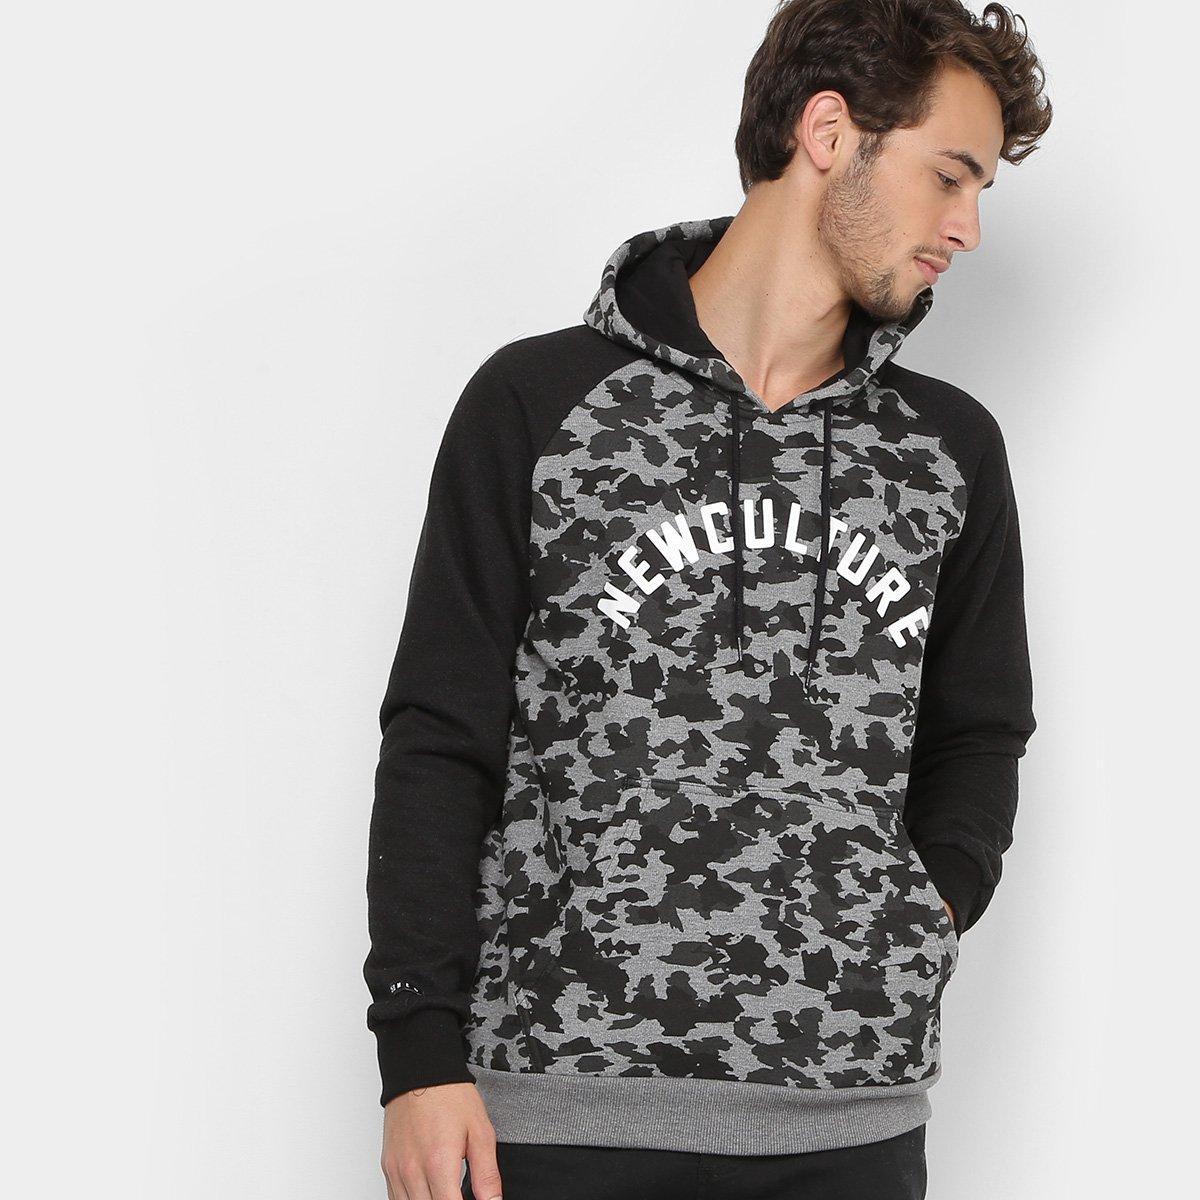 Moletom New Skate Canguru Black Camuflage Masculino - Preto